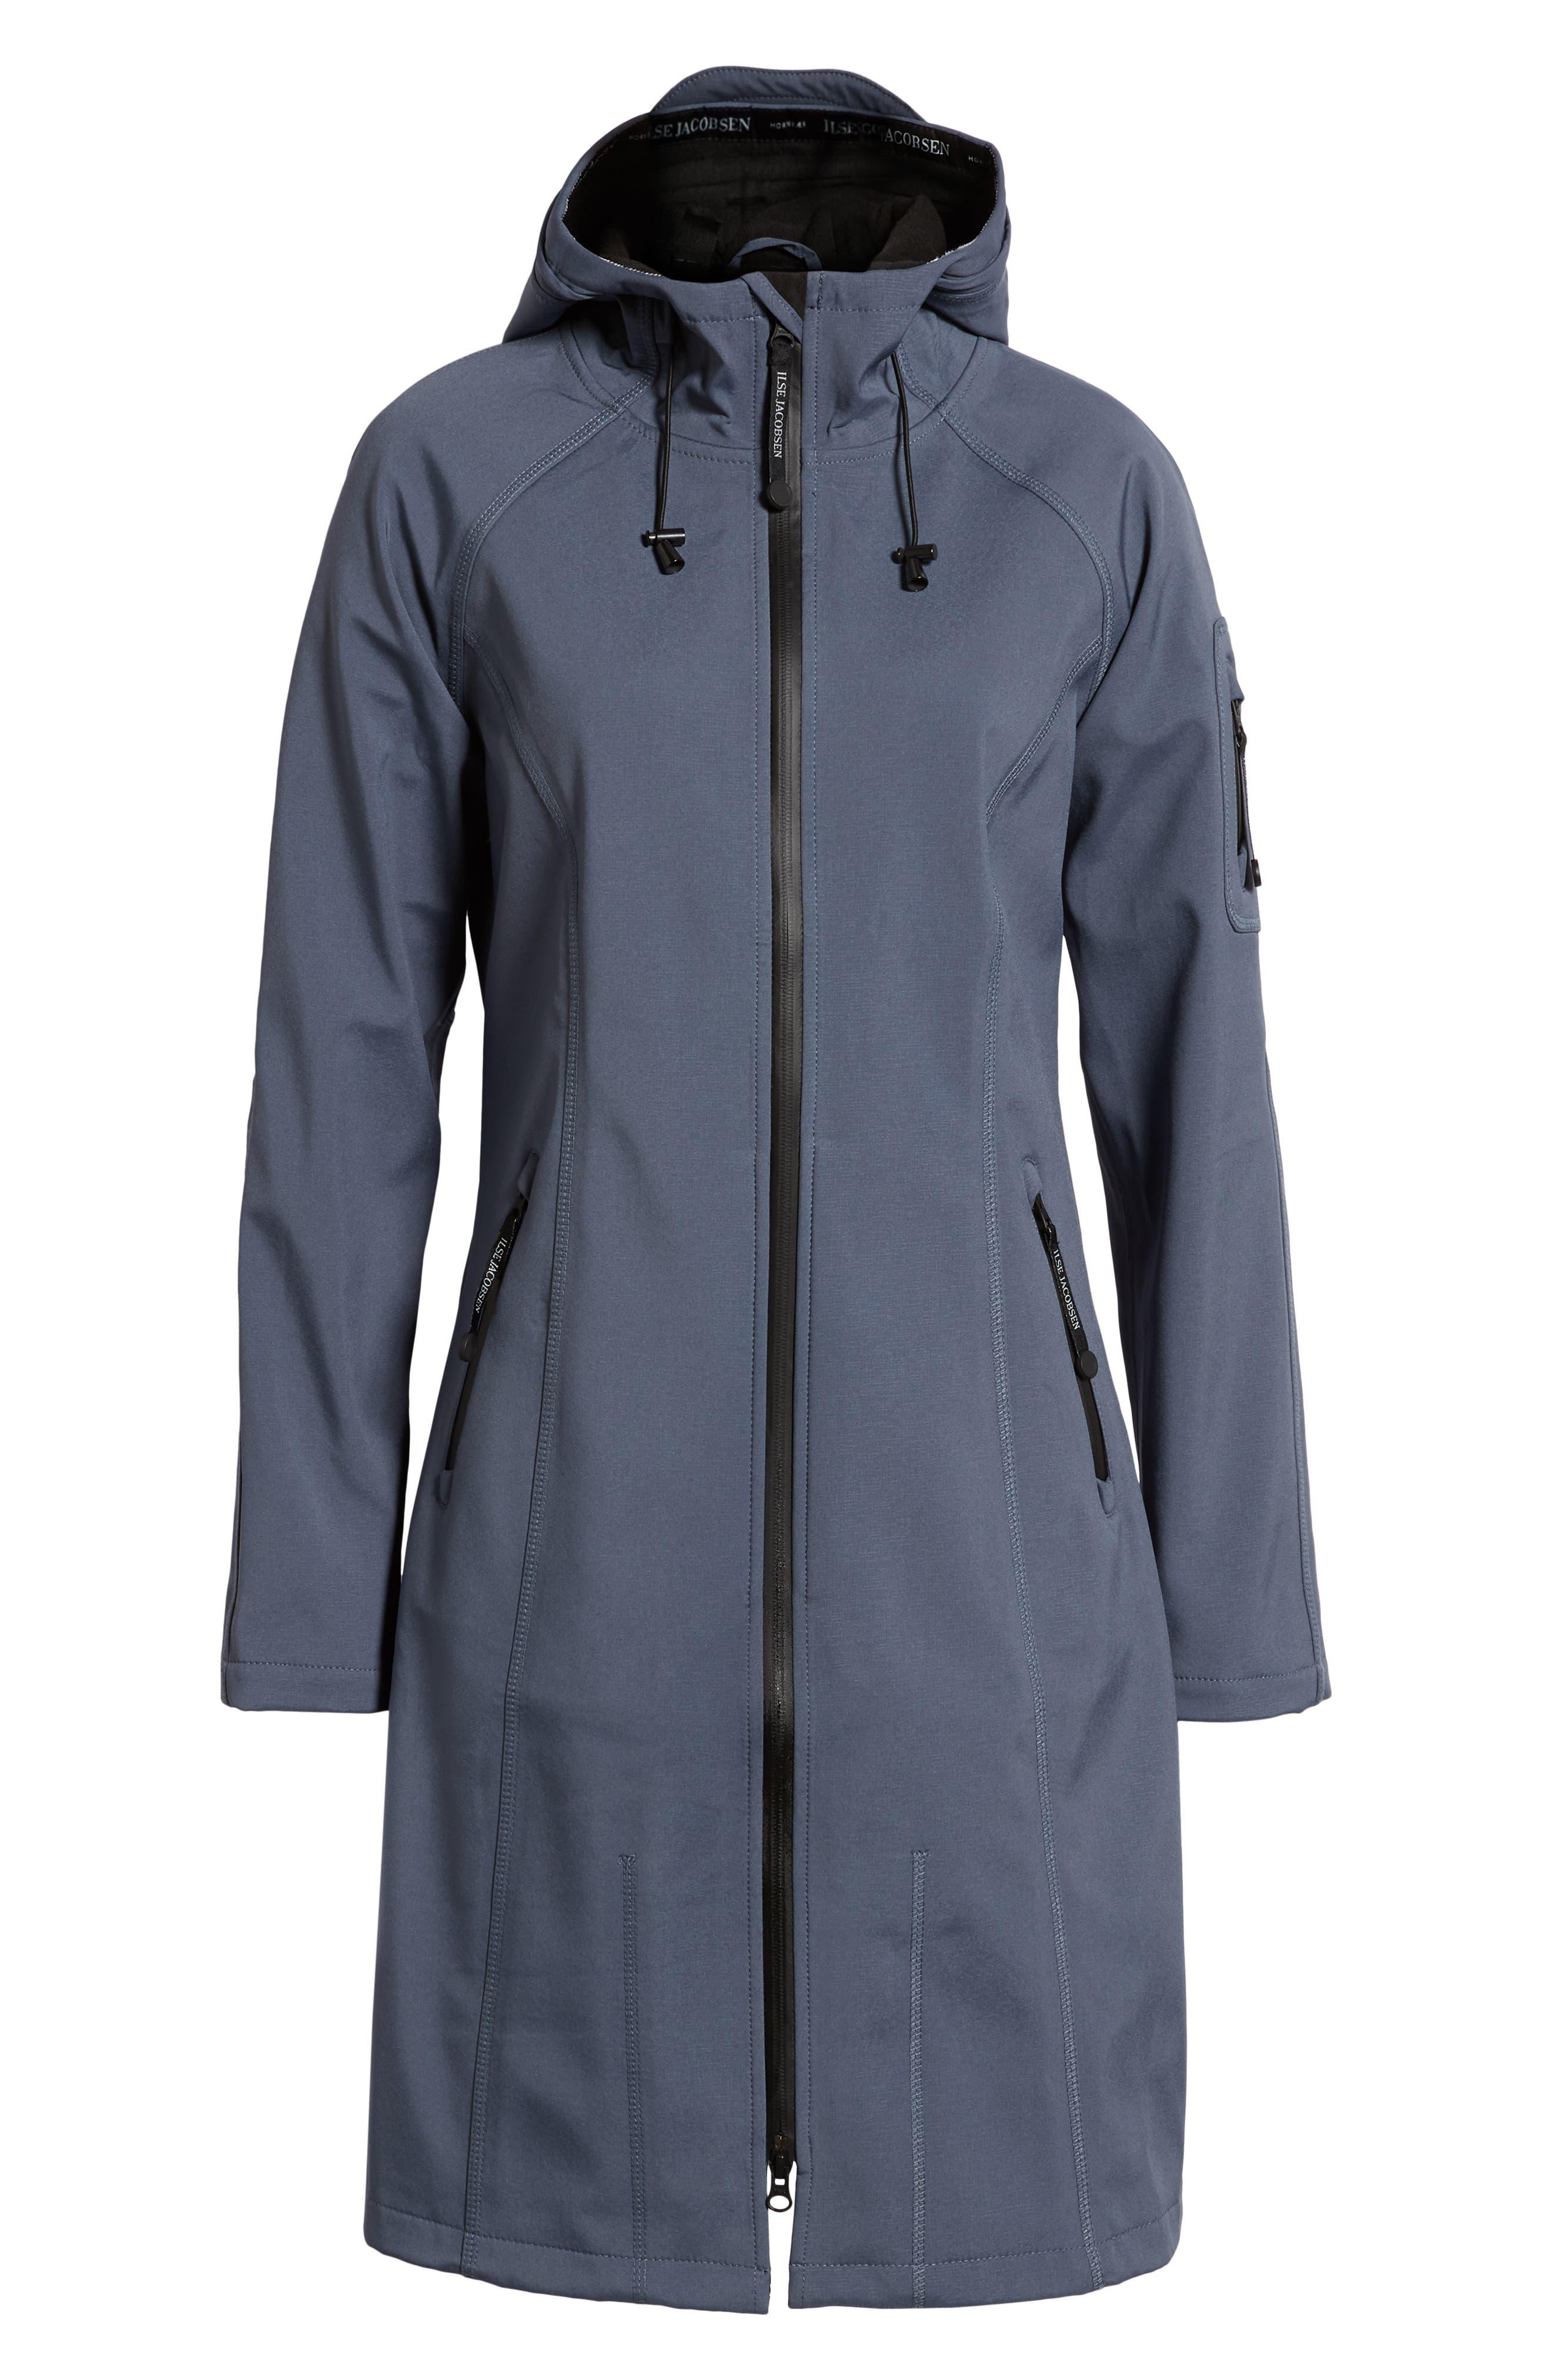 Long Hooded Raincoat,                             Alternate thumbnail 5, color,                             BLUE GRAYNESS